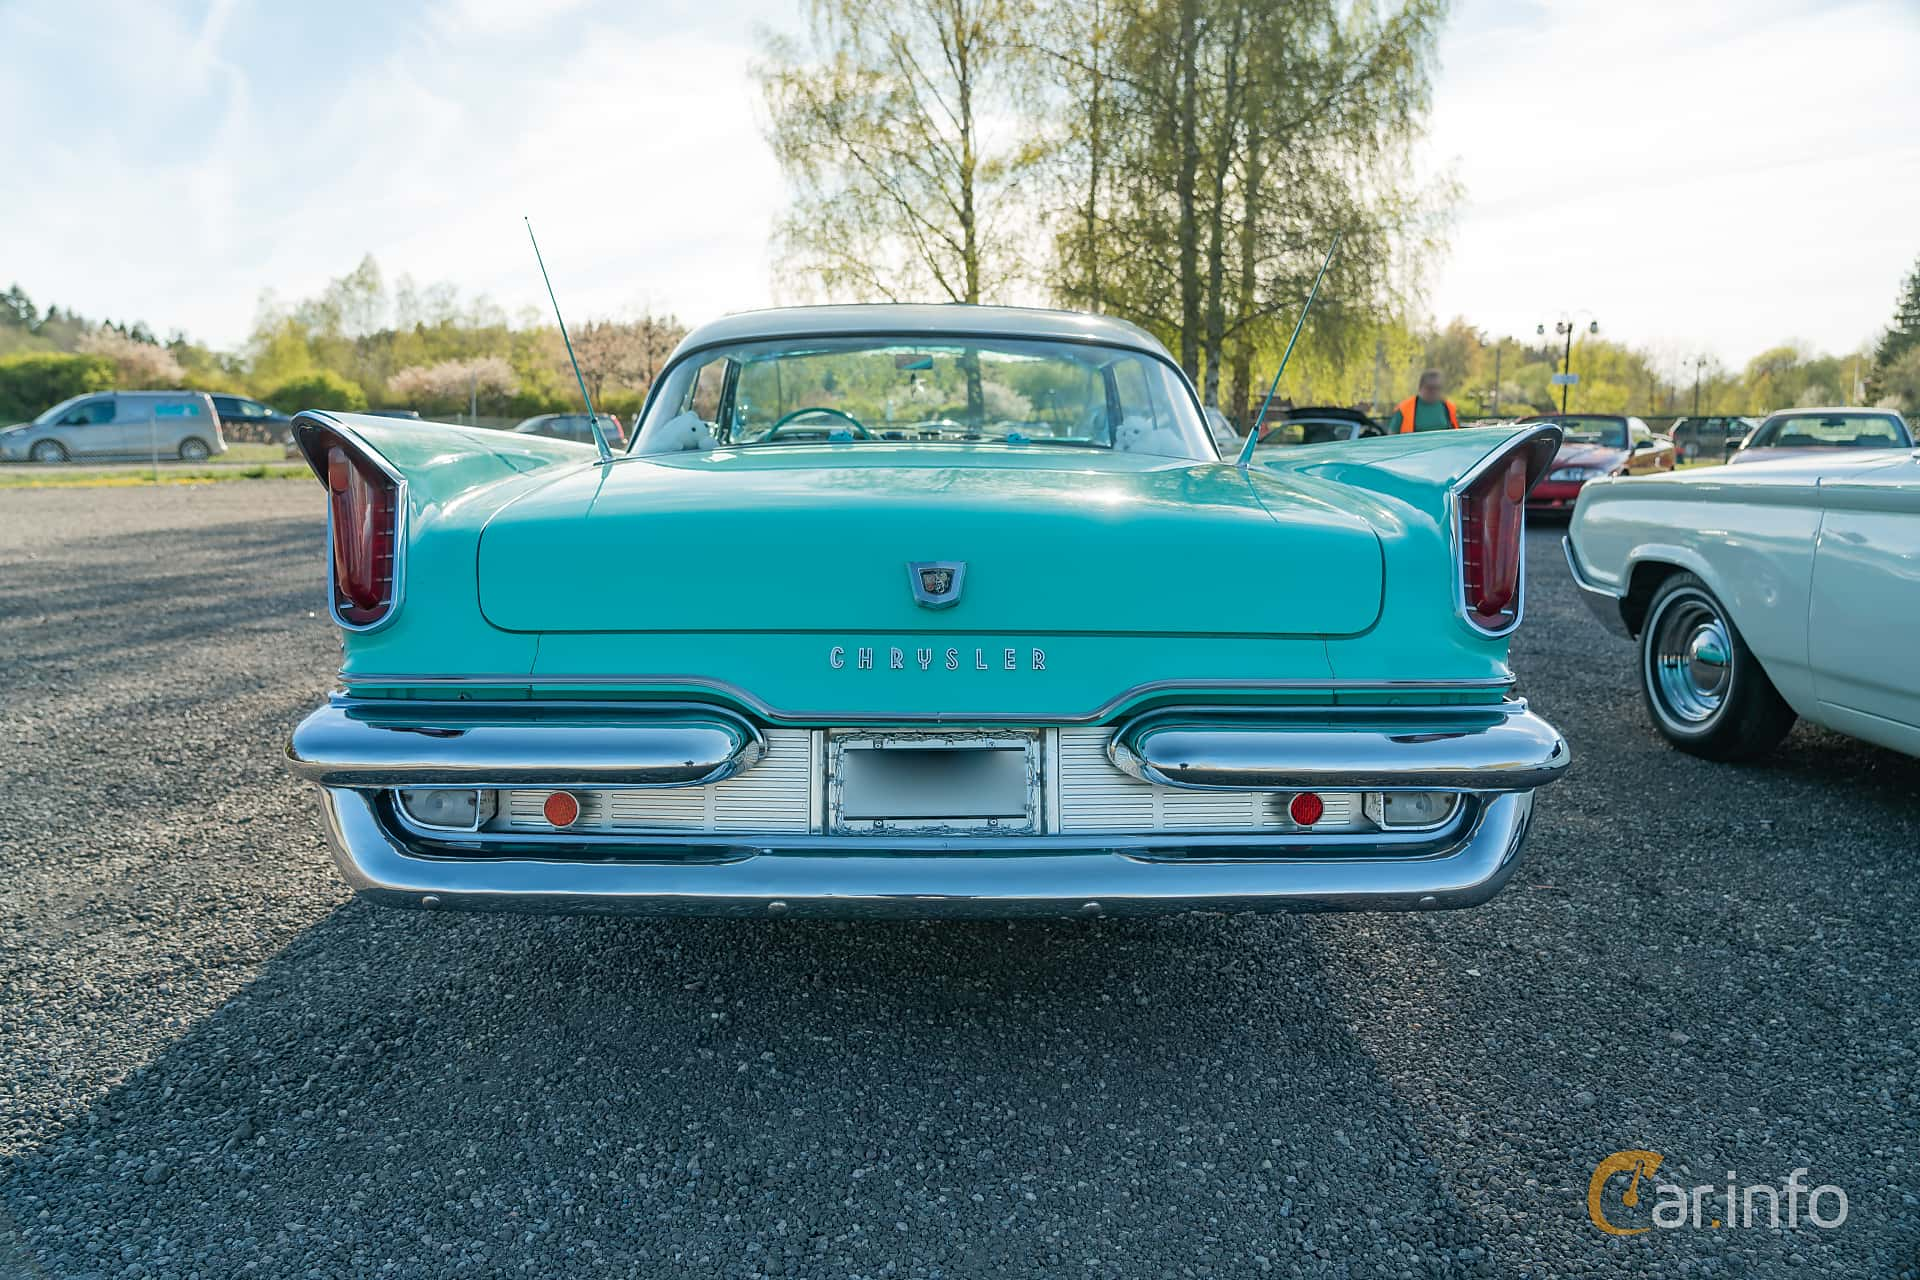 Chrysler Windsor 2-door Hardtop 6.3 V8 Manual, 309hp, 1959 at Lissma Classic Car 2019 vecka 20